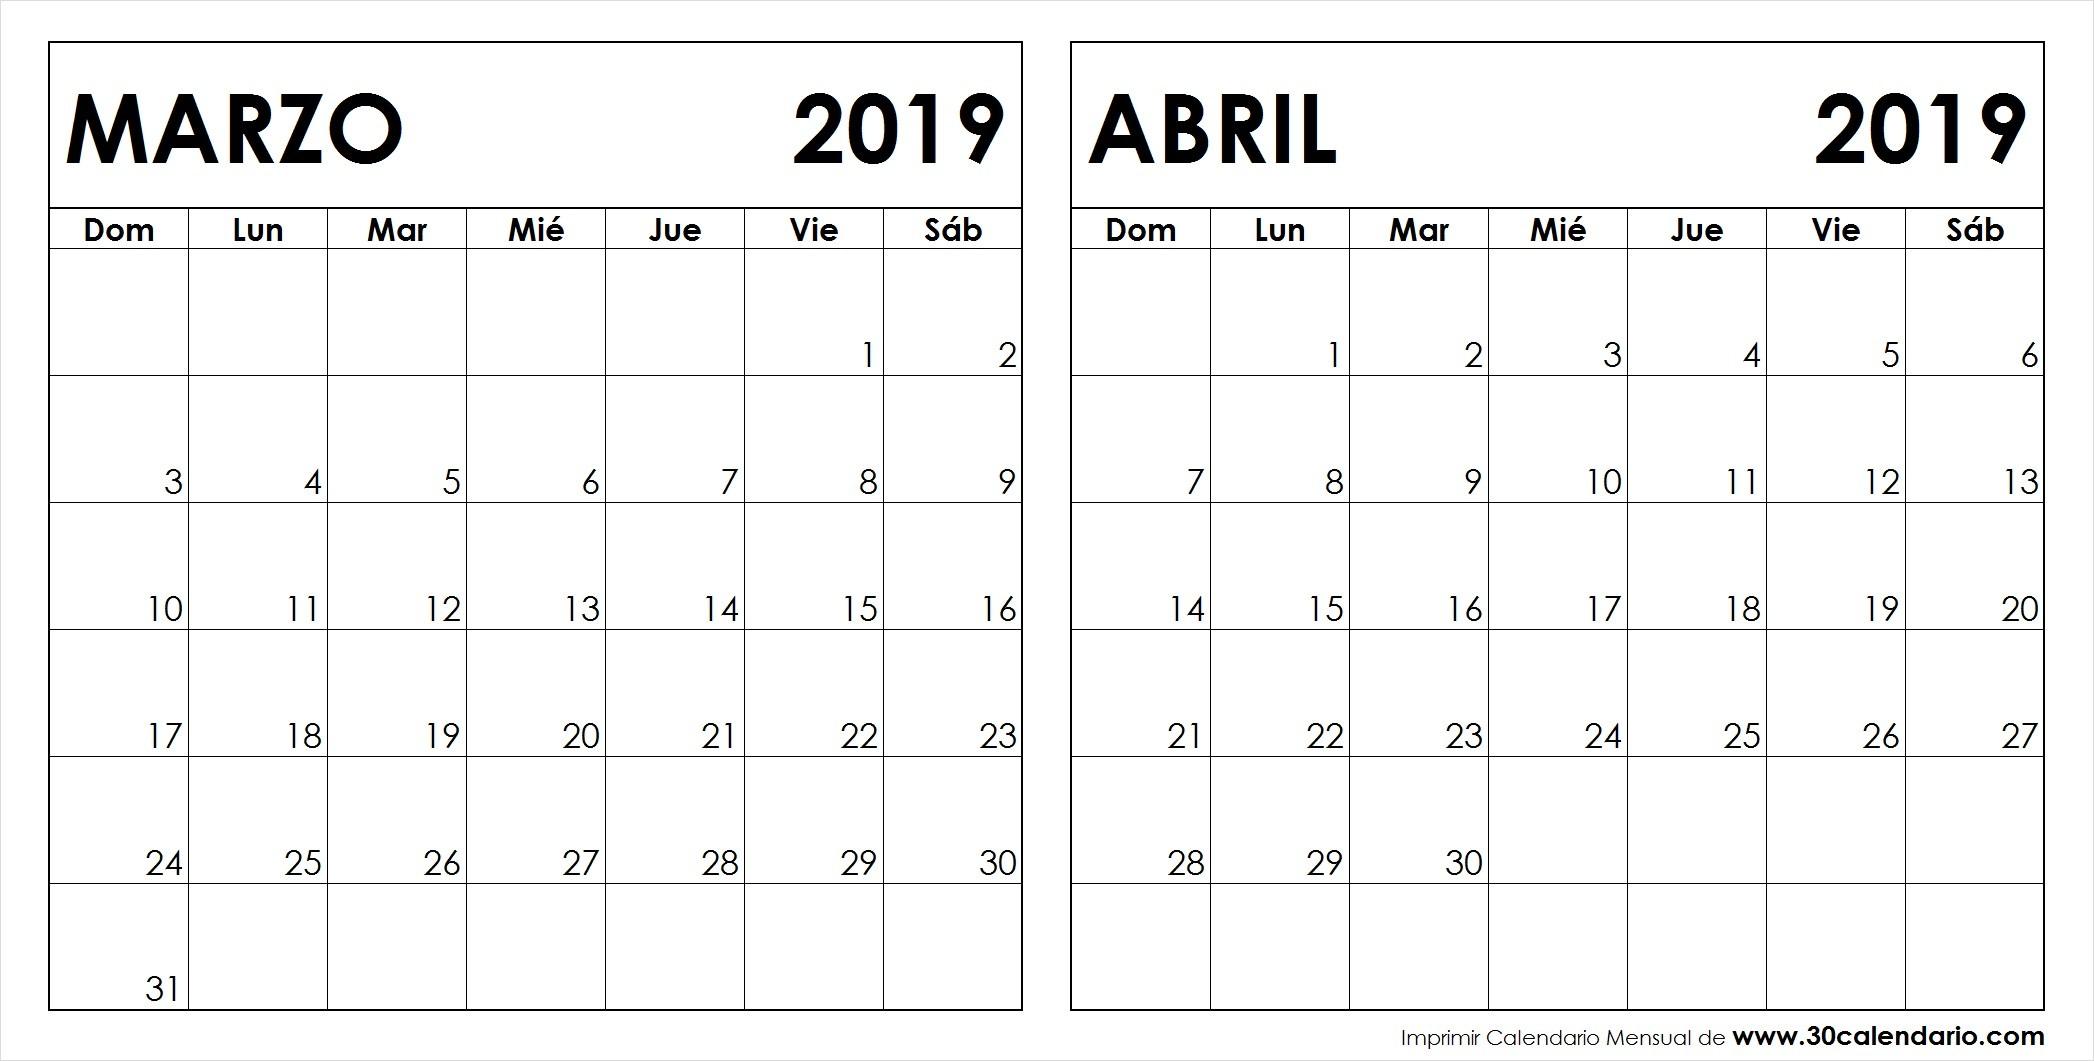 Enero 2018 AQUI Calendario Marzo Abril 2019 Para Imprimir